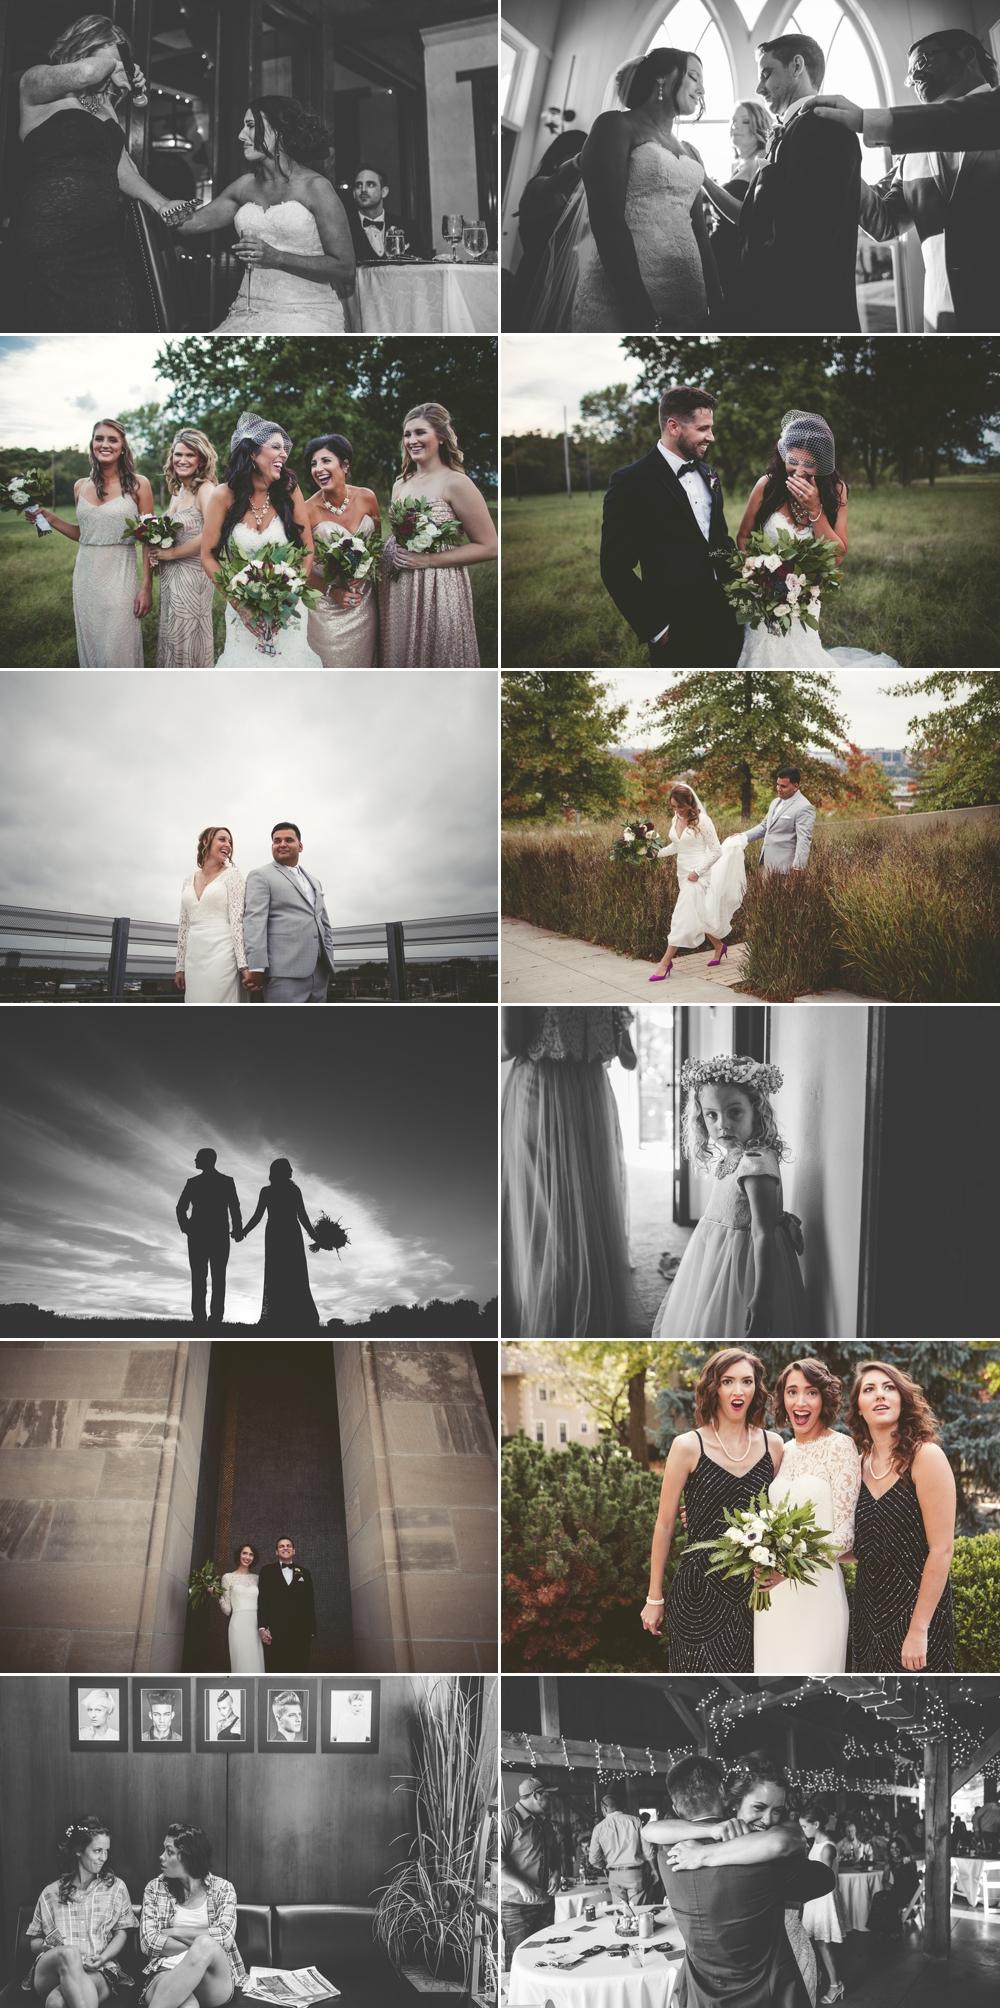 jason_domingues_photography_best_kansas_city_photography_kc_wedding_weddings0006.jpg